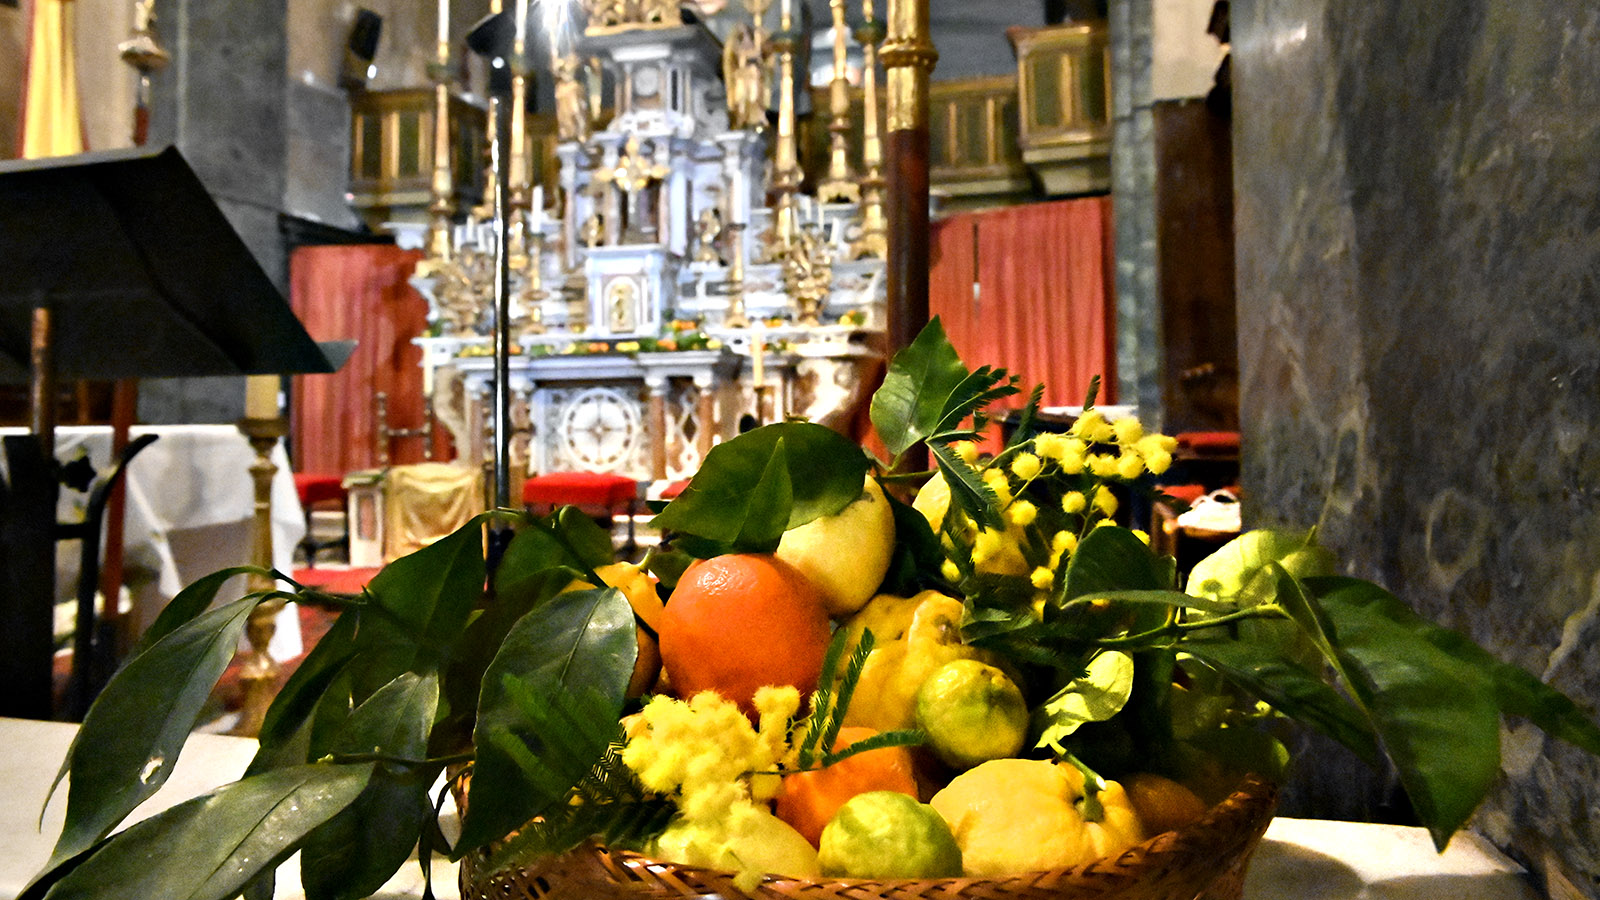 Fête di Citron: Segnung der Zitrusfrüchte bei der Messe in der Kathedrale. Foto: Hilke Maunder